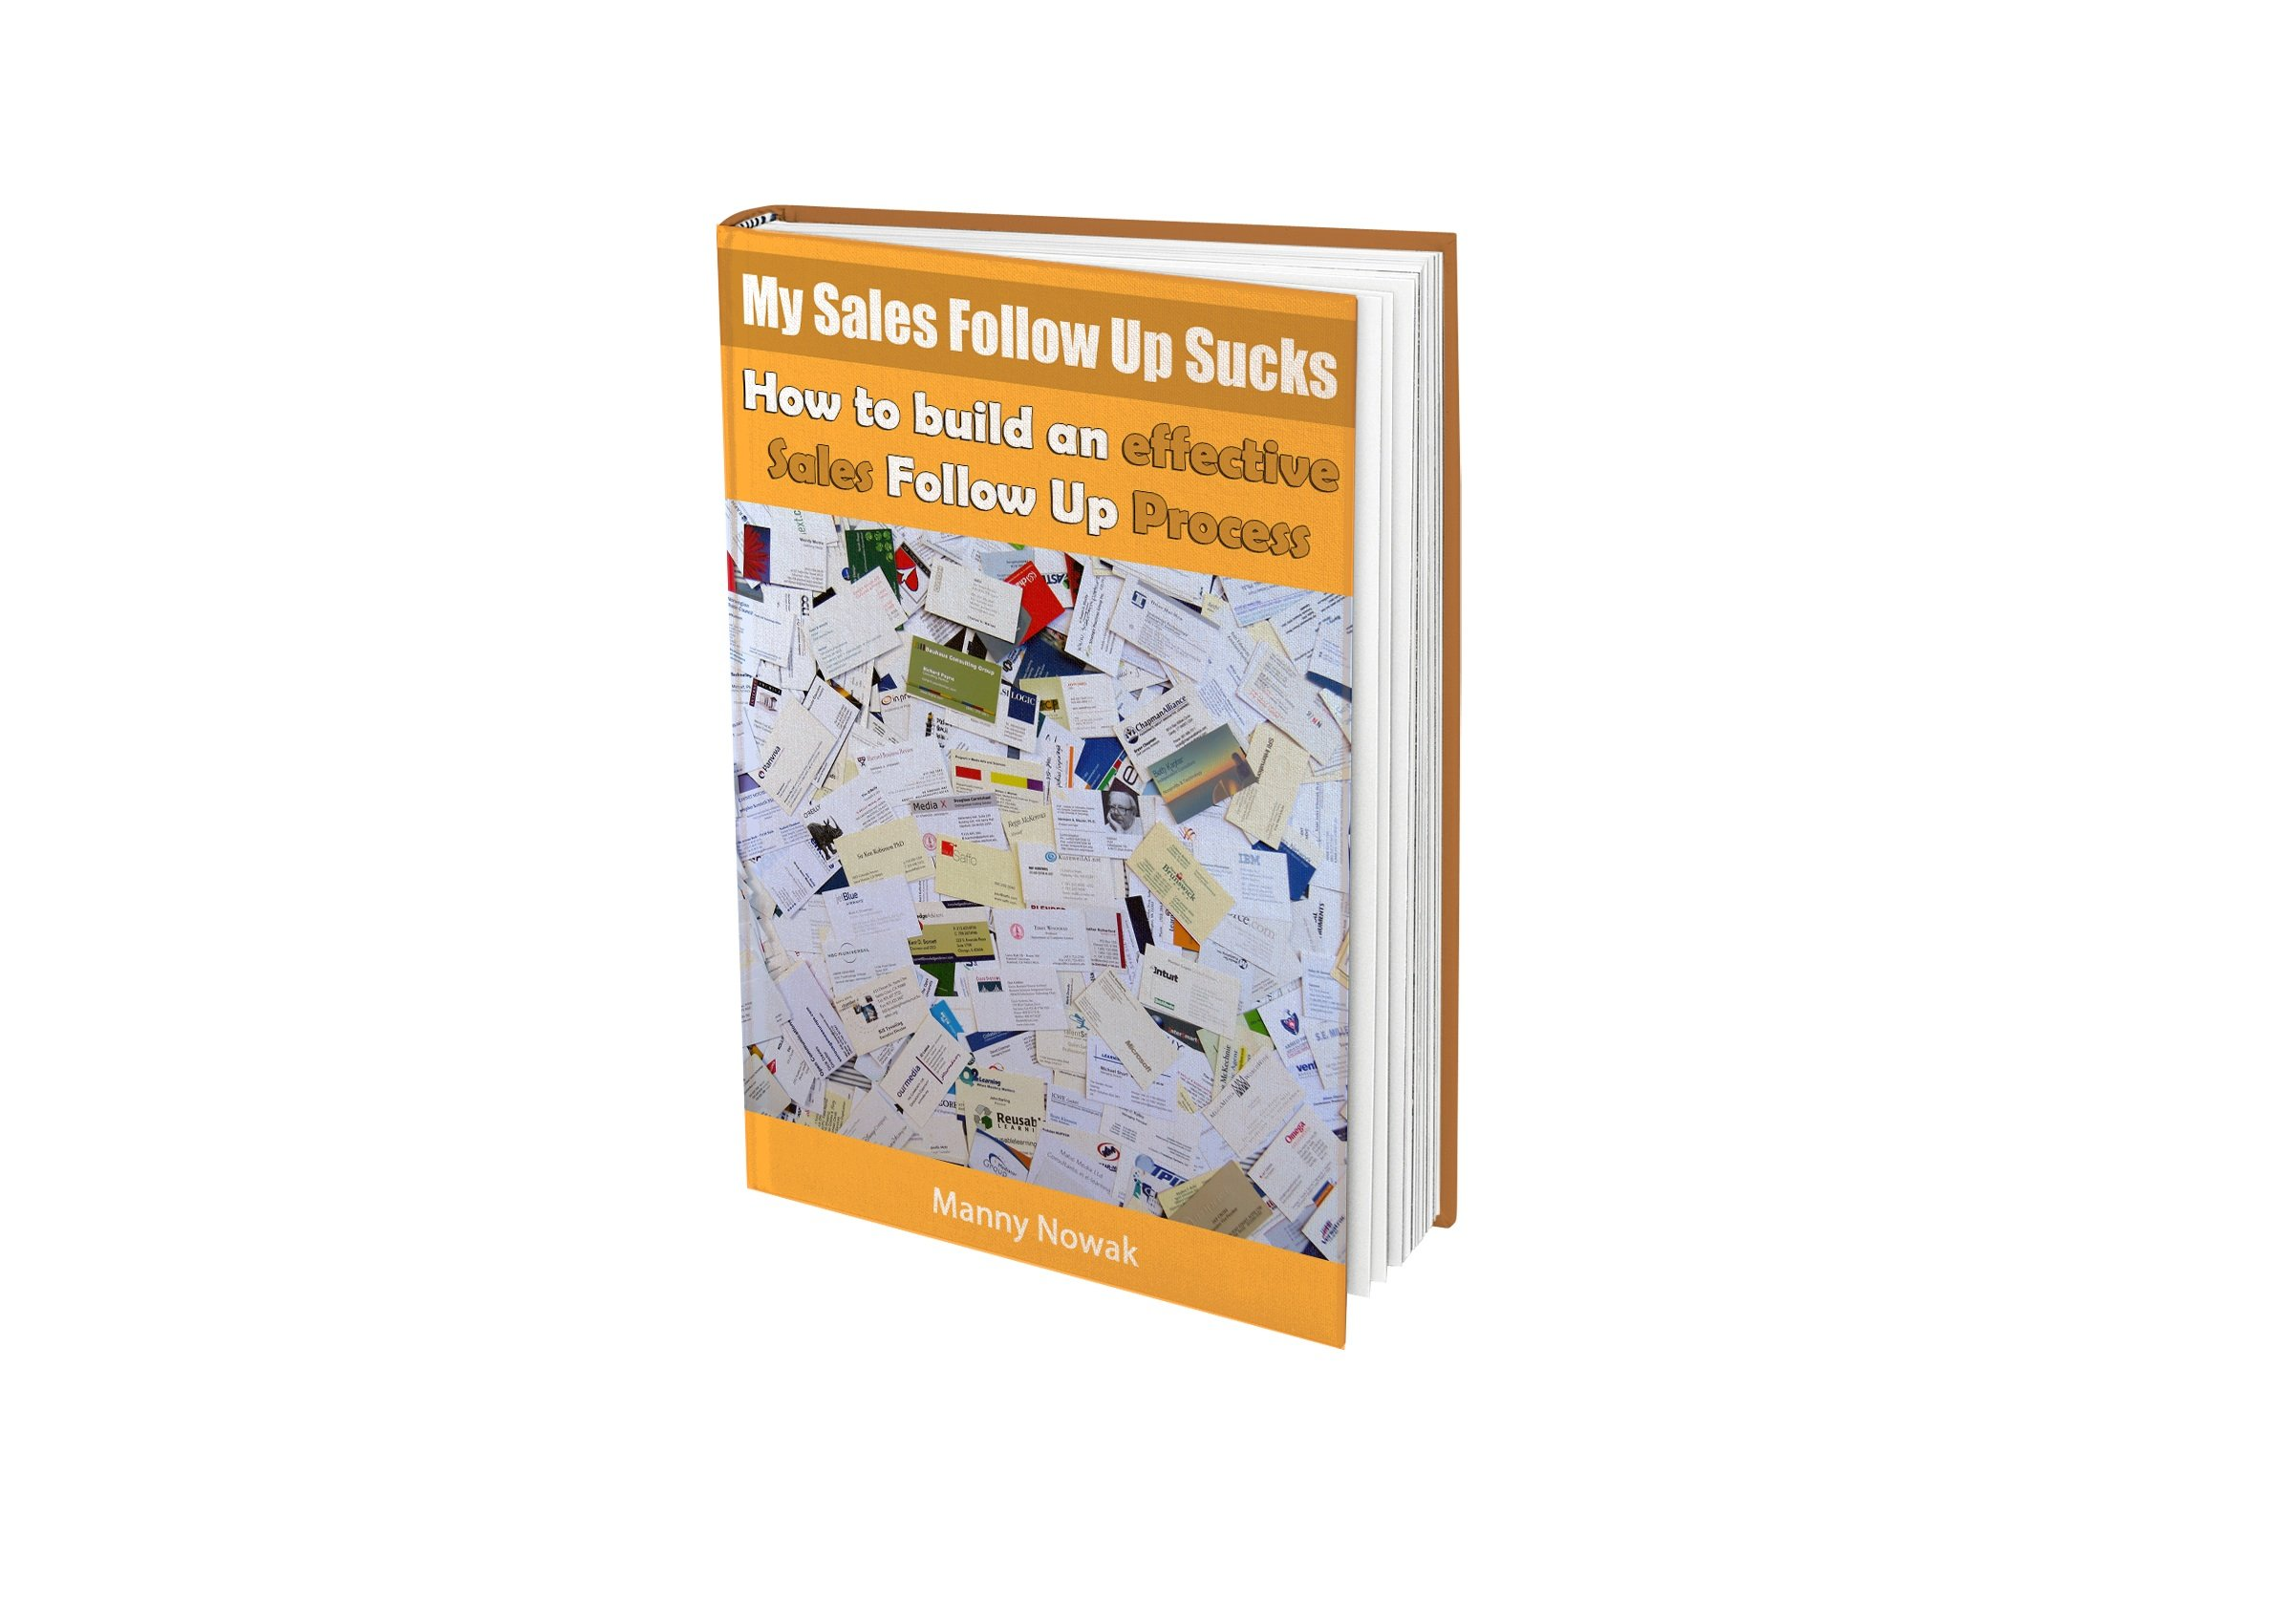 My Sales Follow Up Sucks: How to Build an Effective Sales Follow Up Process (Sales Success from Coach Manny Nowak Book 1)